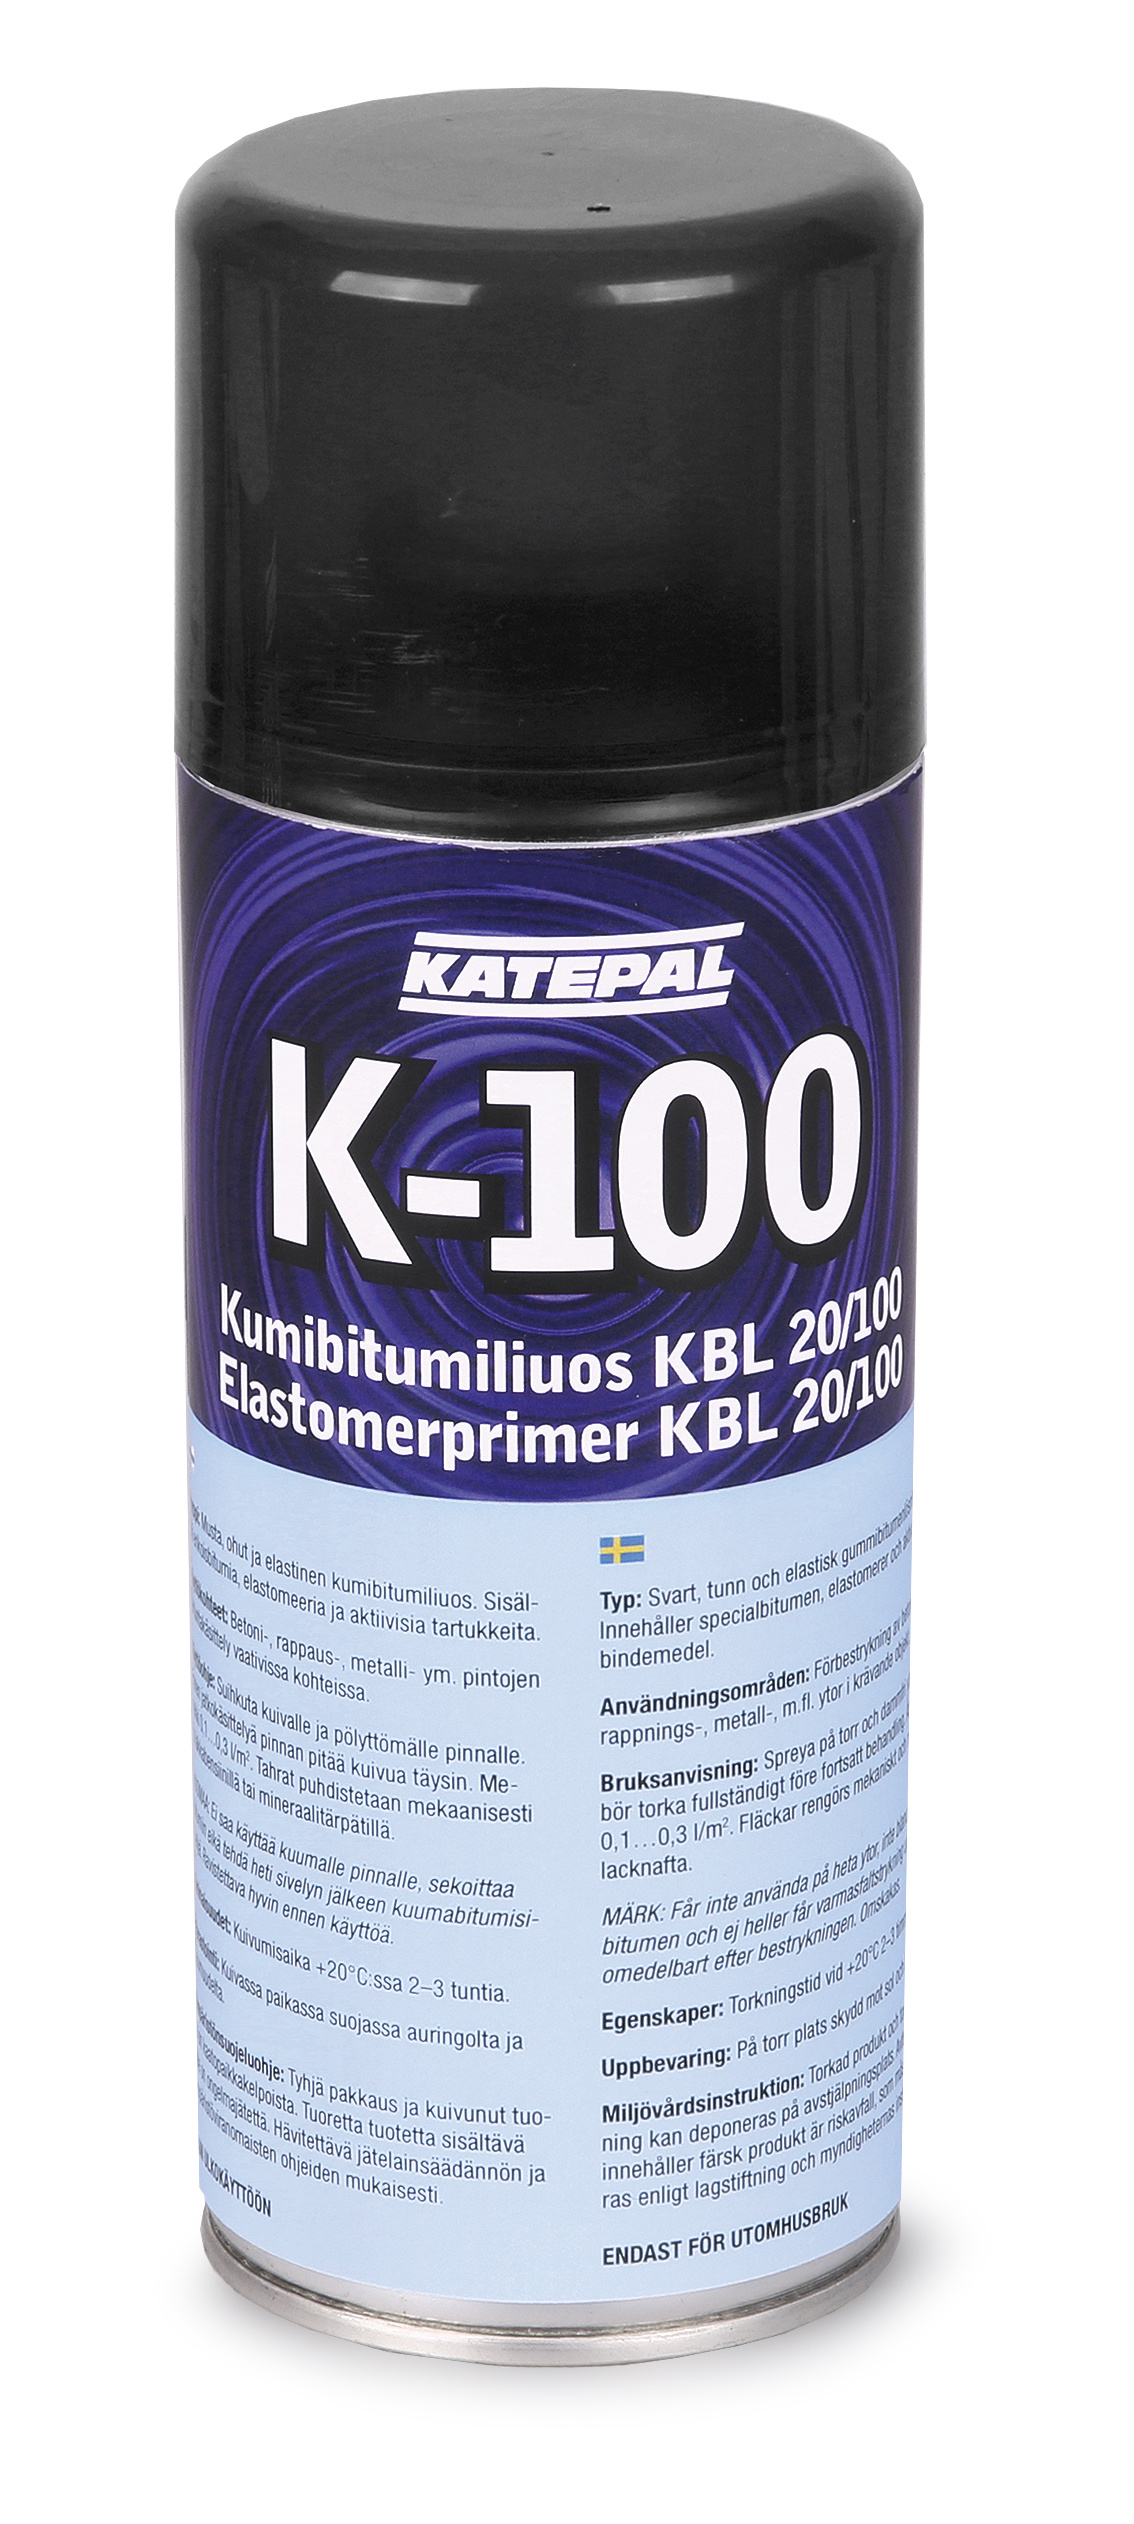 K-100 Kumibitumiliuos